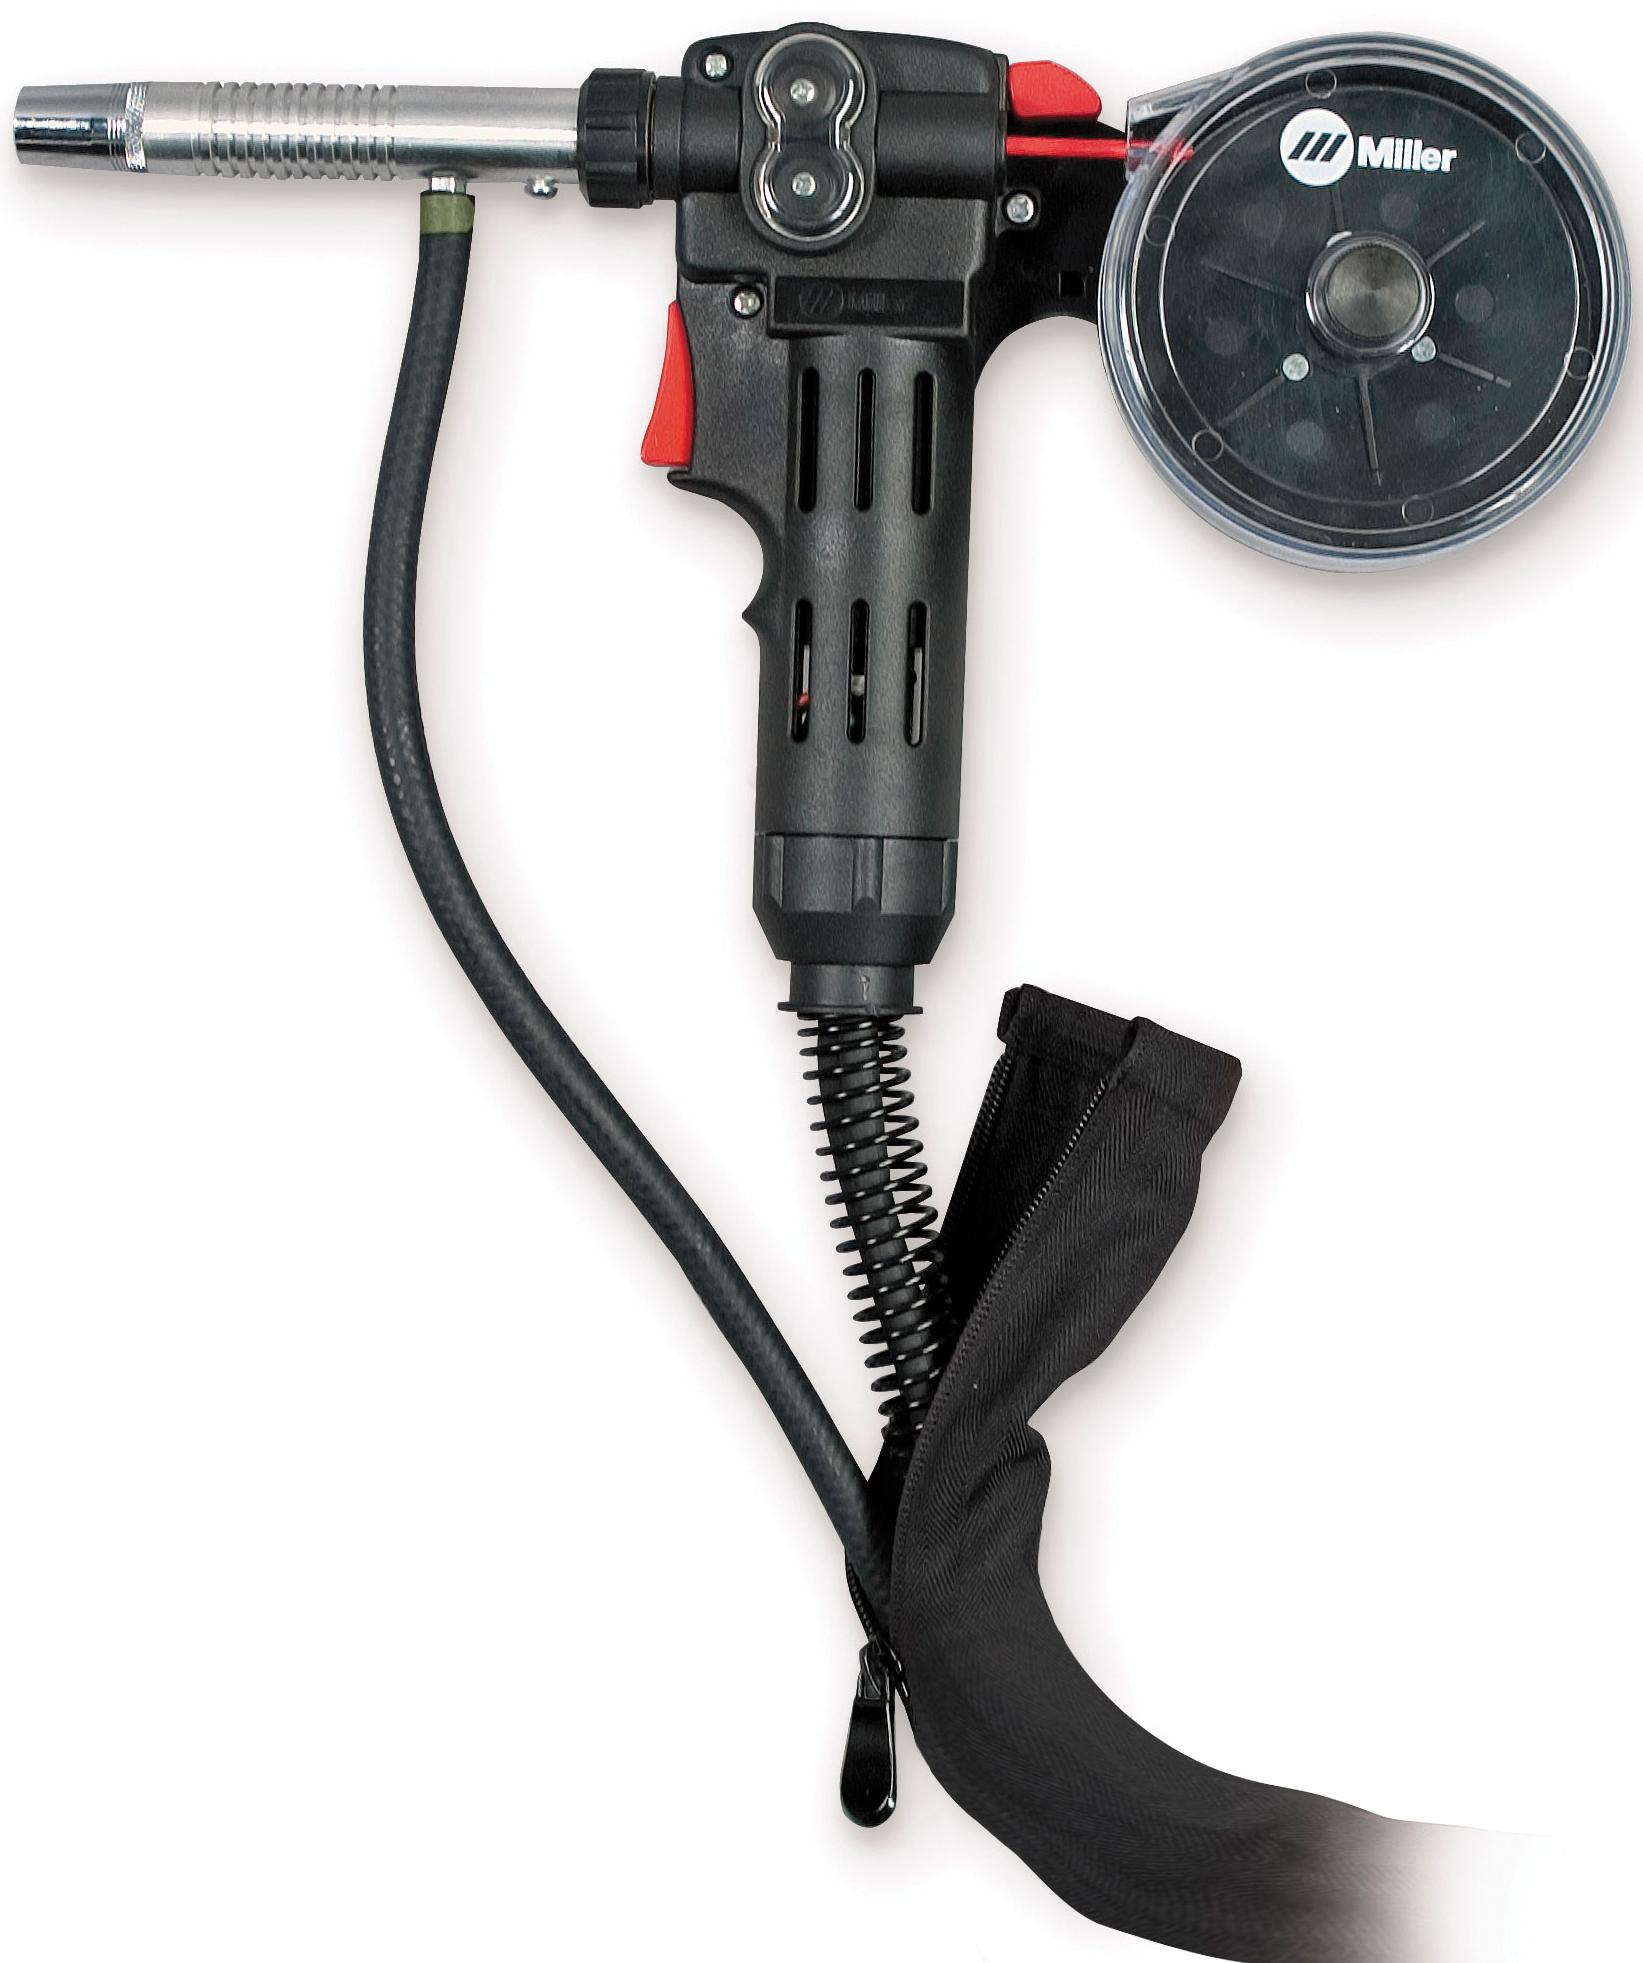 251 gun millermatic spool Miller Spoolmate